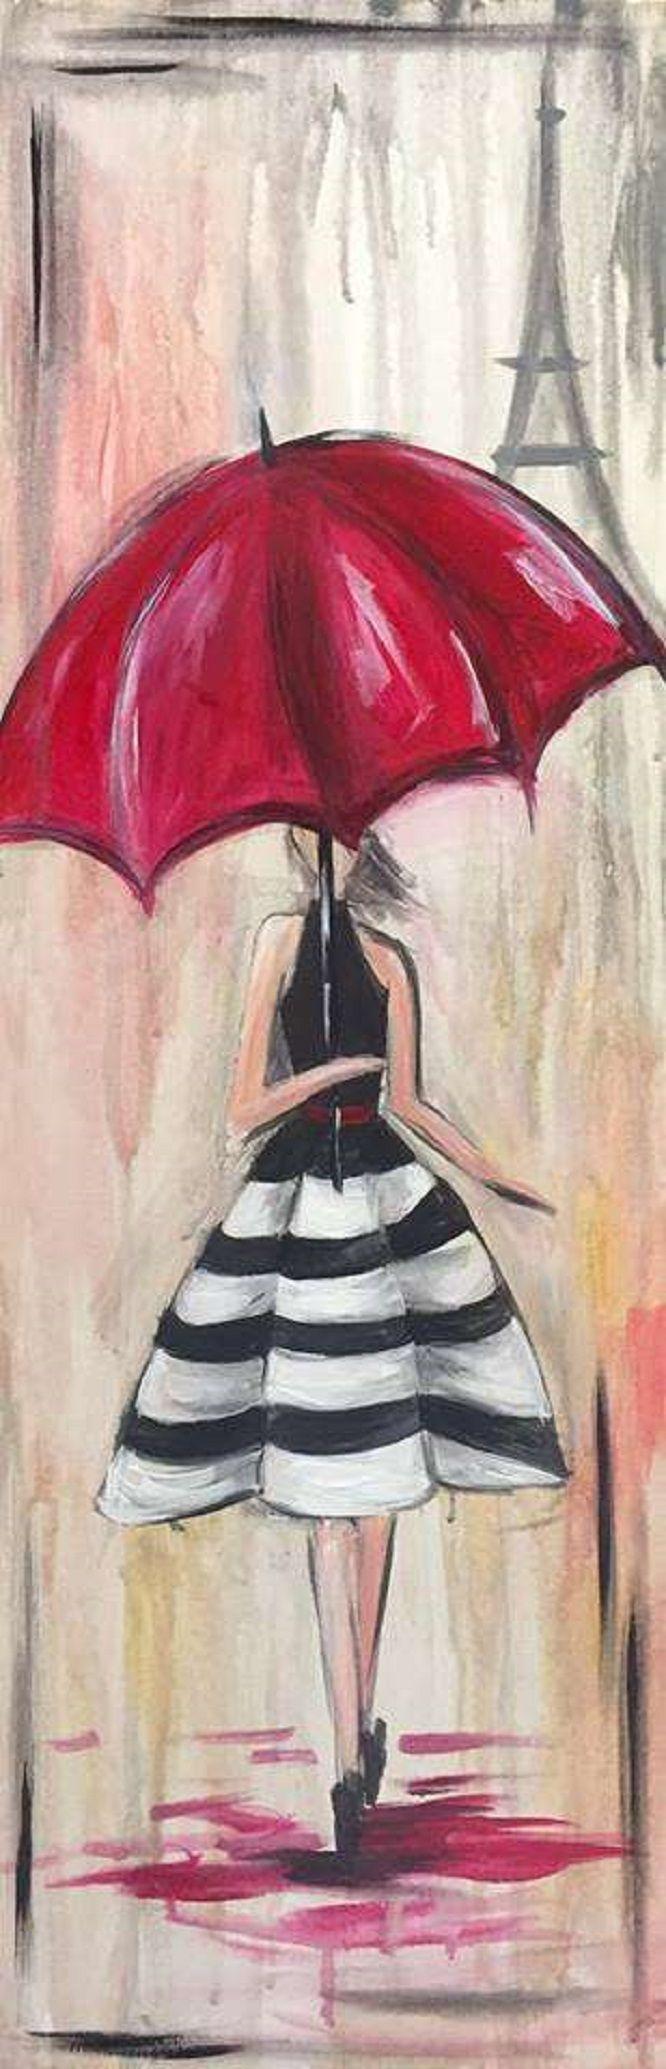 Paris In The Rain Ladies Night Out Idea Paintandsip Bacheloretteparty Https Www Pinotspalette Co Canvas Art Painting Amazing Art Painting Art Painting